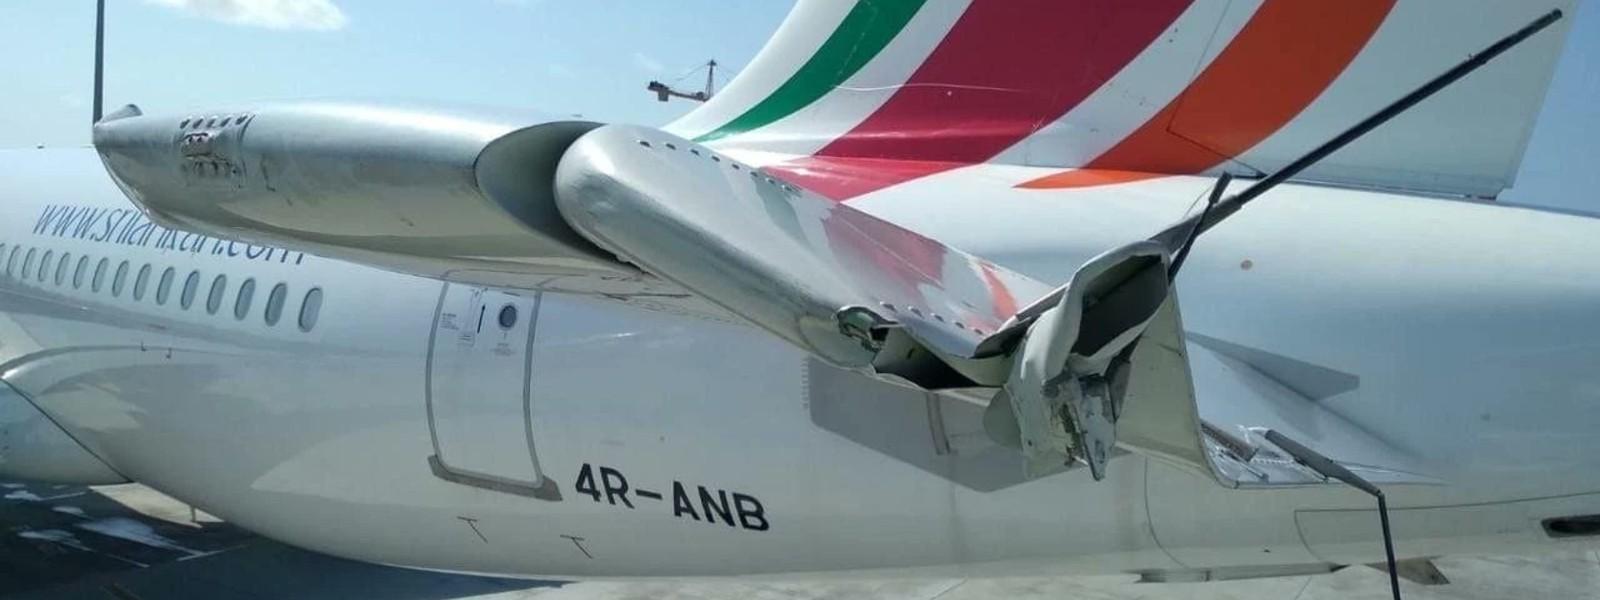 SriLankan Flight Damaged In Male In Ground Vehicle Collision